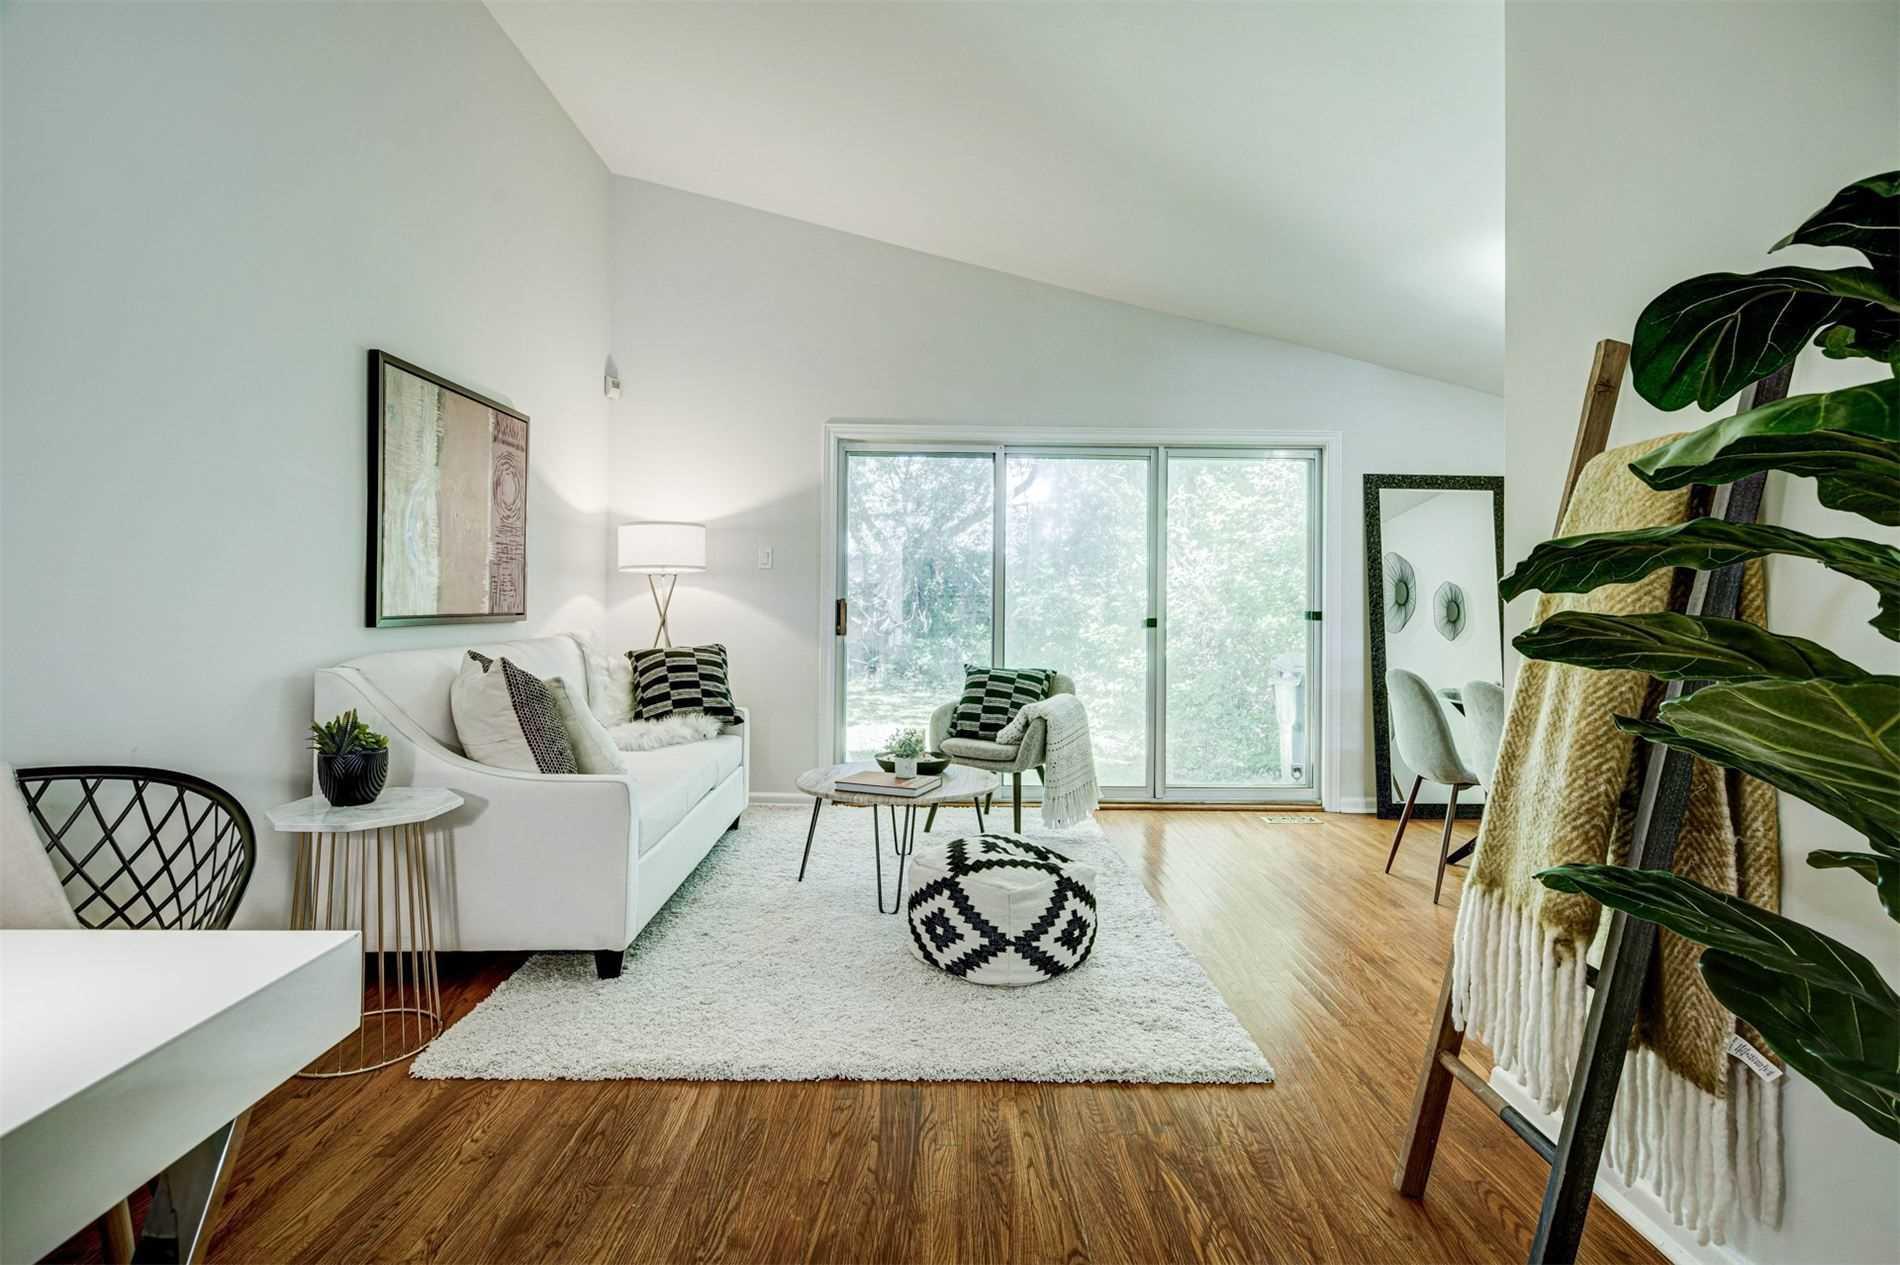 140 Verobeach Blvd - Humbermede Detached for sale, 3 Bedrooms (W5385046) - #4